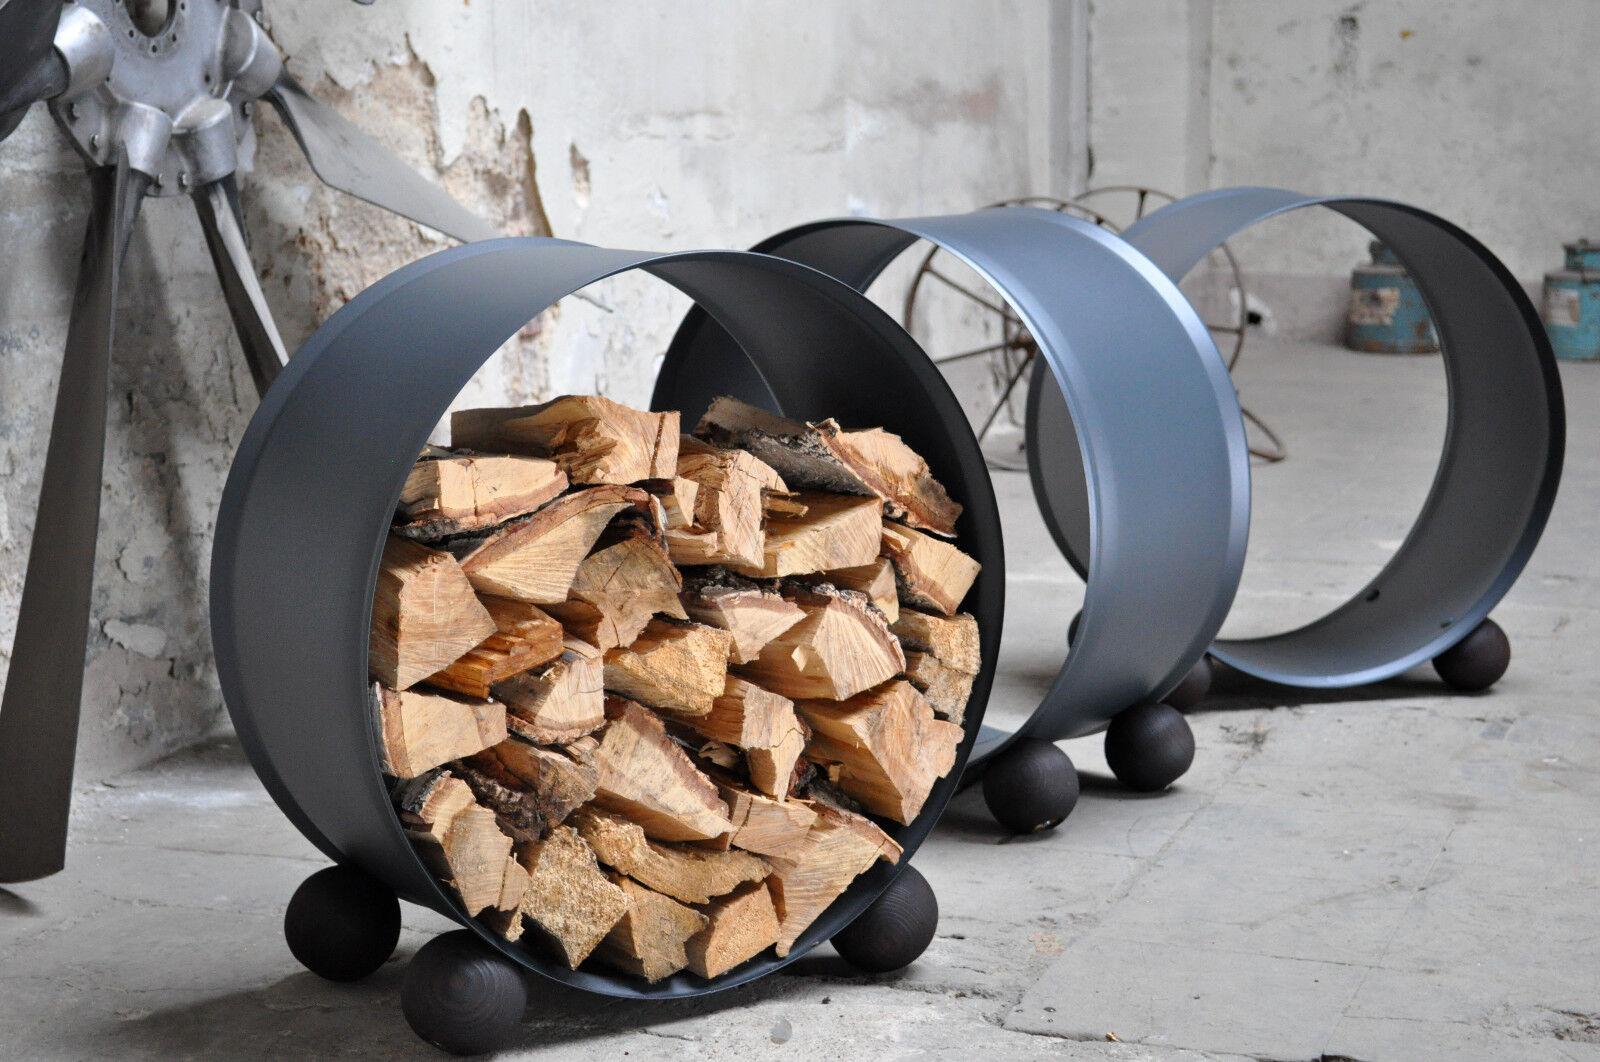 Holzkorb aus 200 Liter Neu Fass mit Kugelfüße aus Holz - Fasskorb